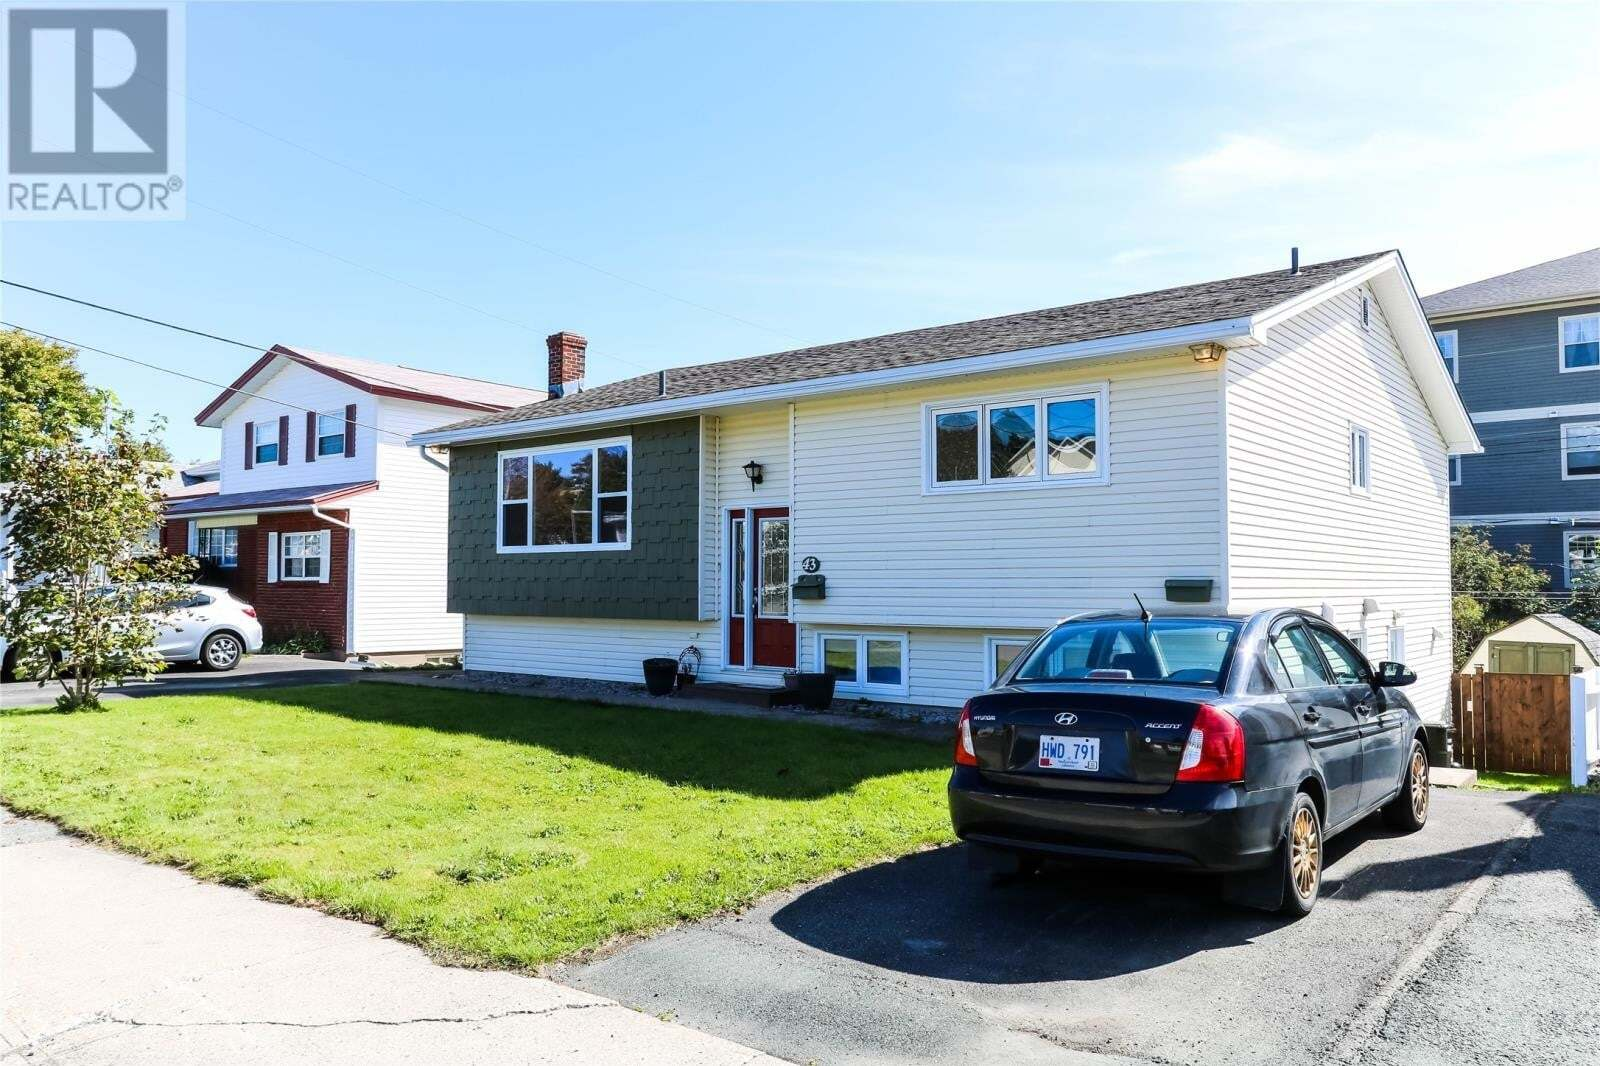 House for sale at 43 Ferryland St East St. John's Newfoundland - MLS: 1221578